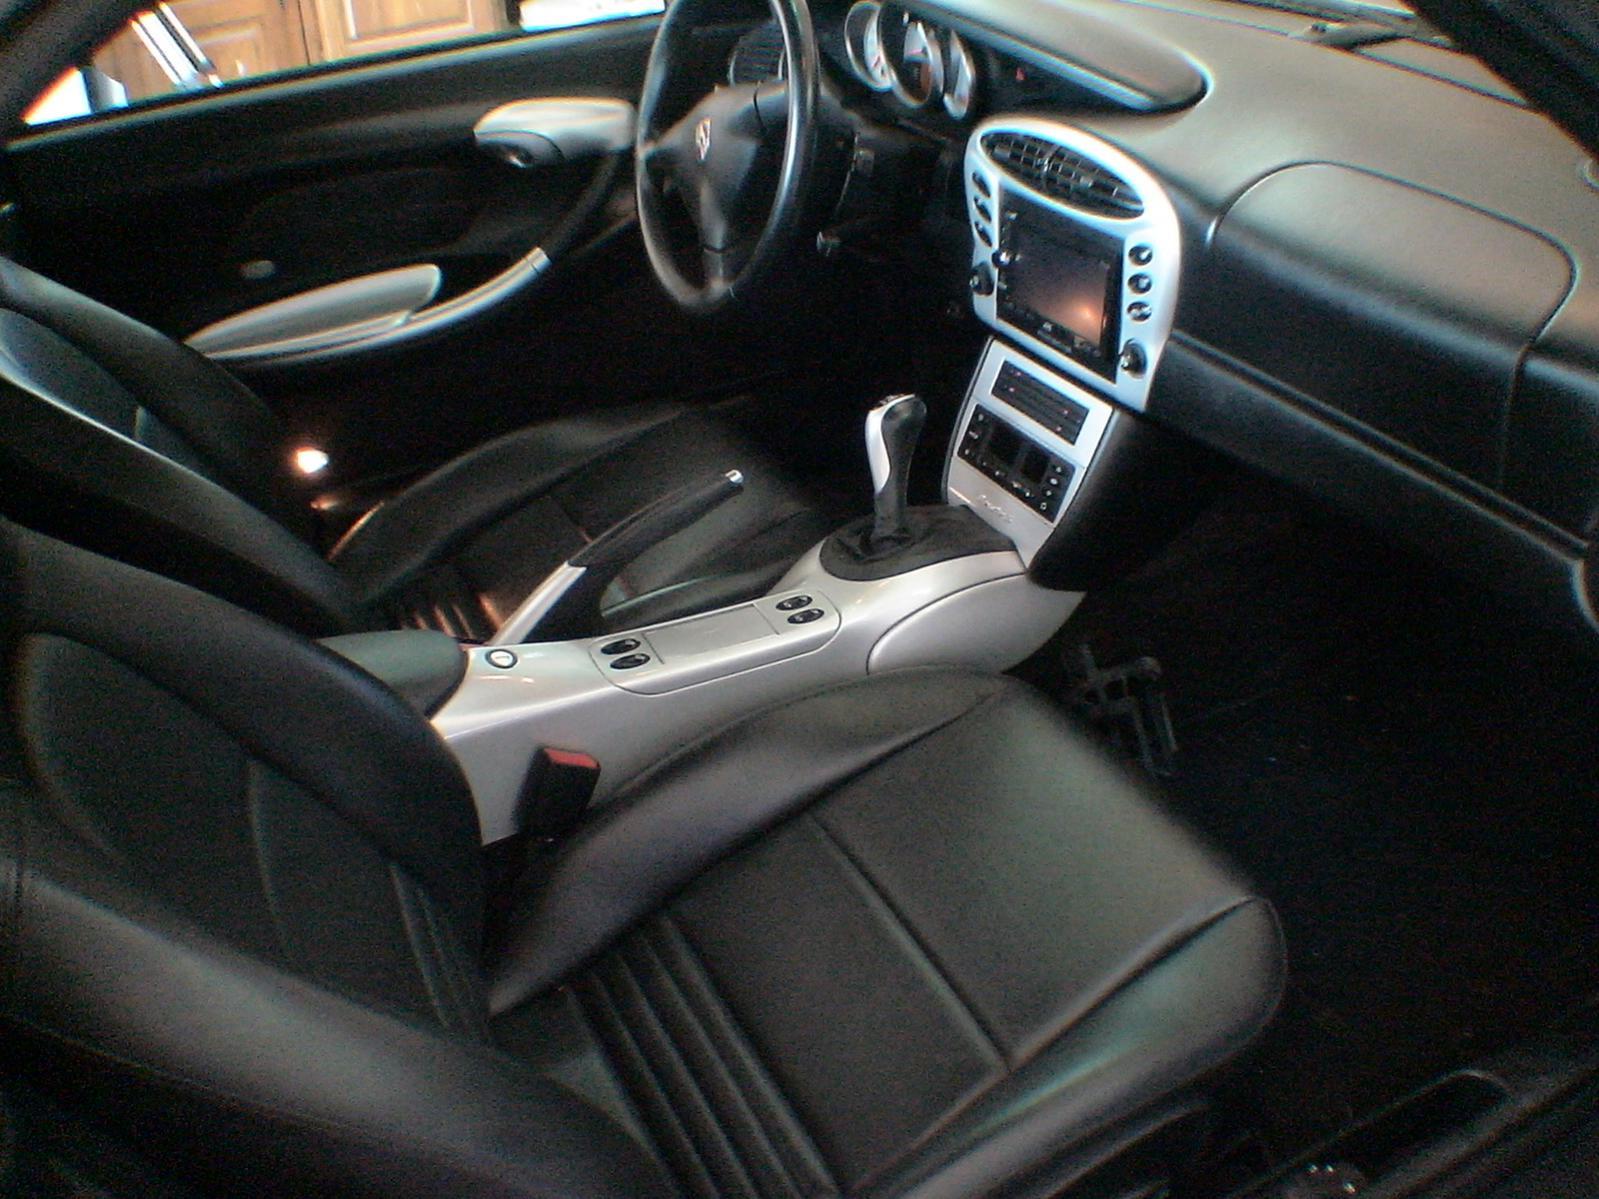 Porsche Boxster 2000 Interior Discoloration 986 Forum